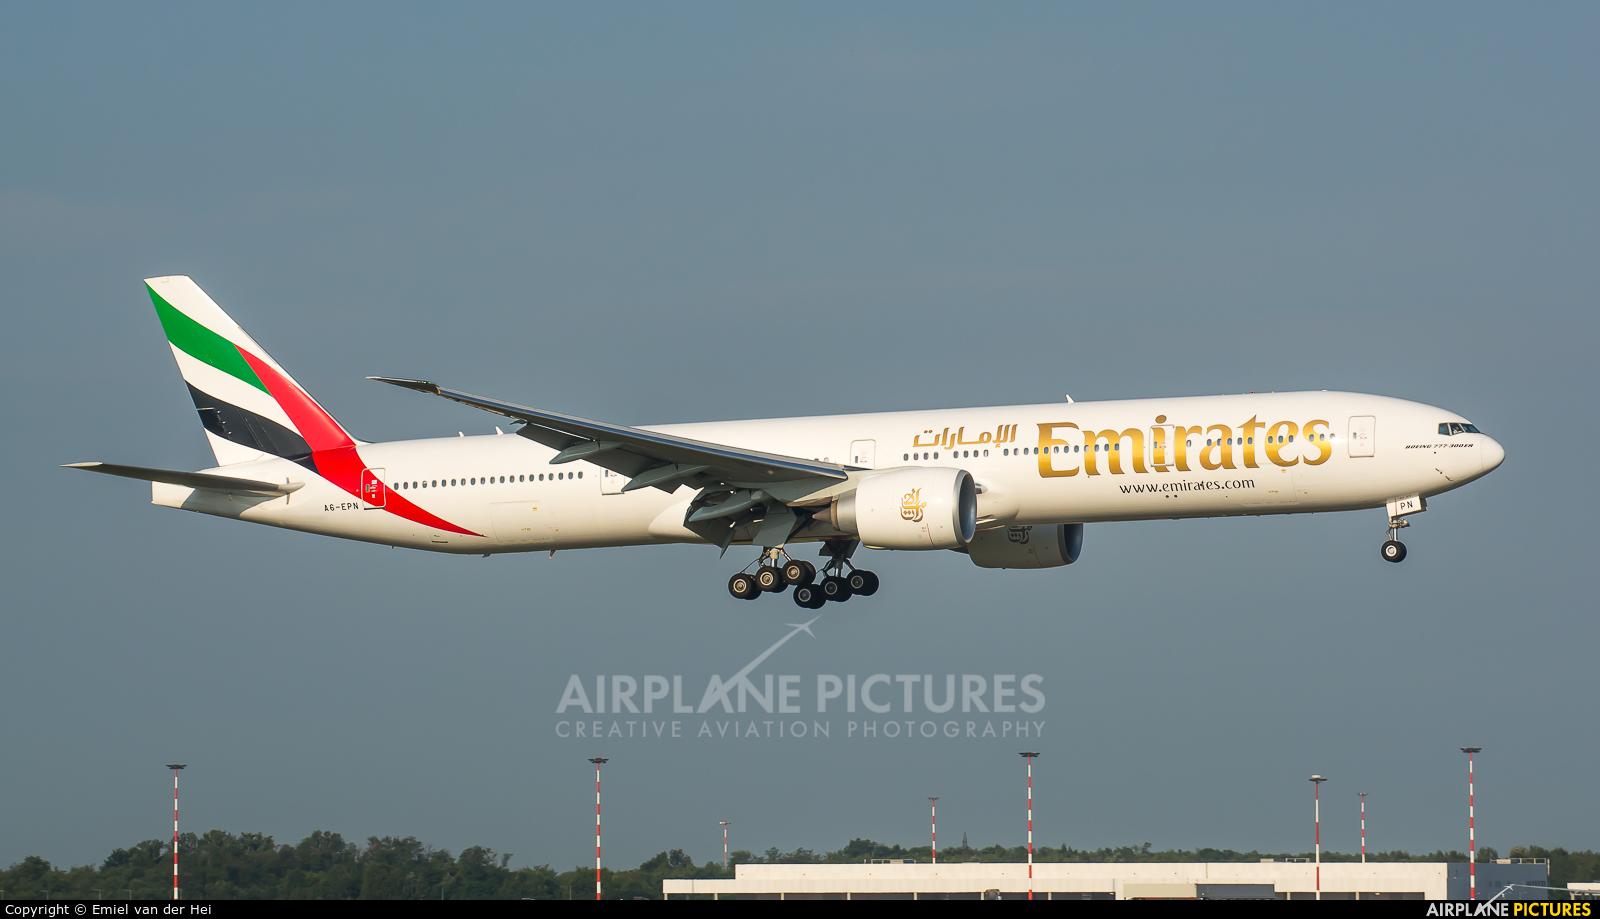 Emirates Airlines A6-EPN aircraft at Milan - Malpensa